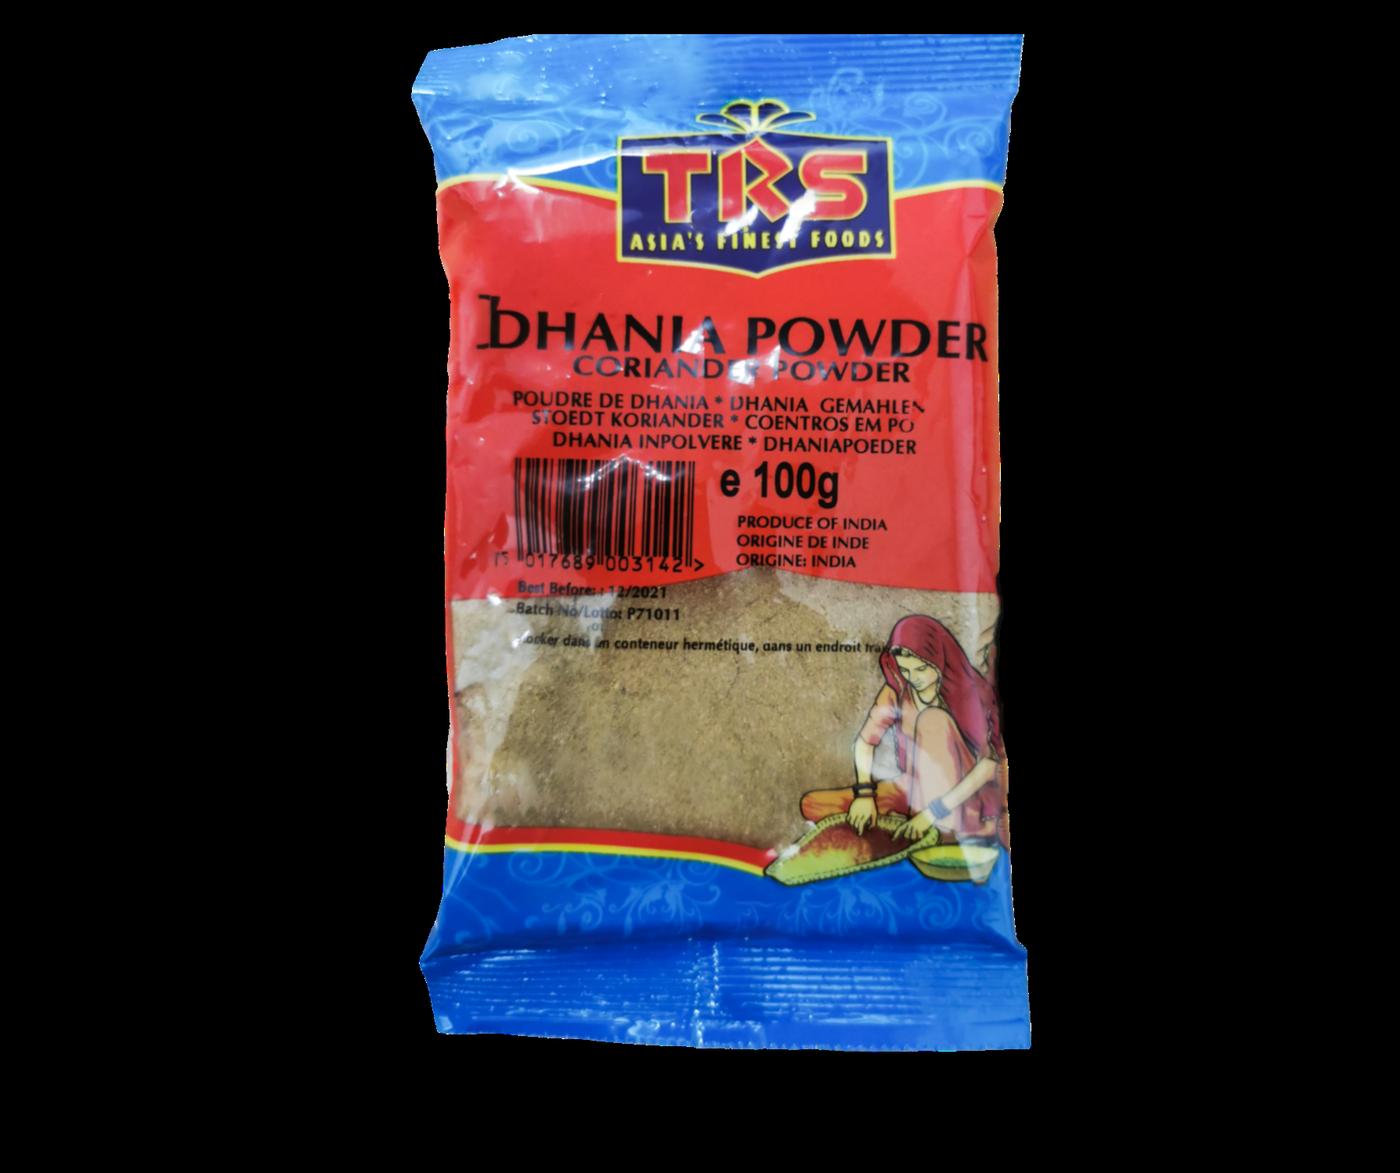 TRS  Dhania Powder/Coriander Powder( Indori)